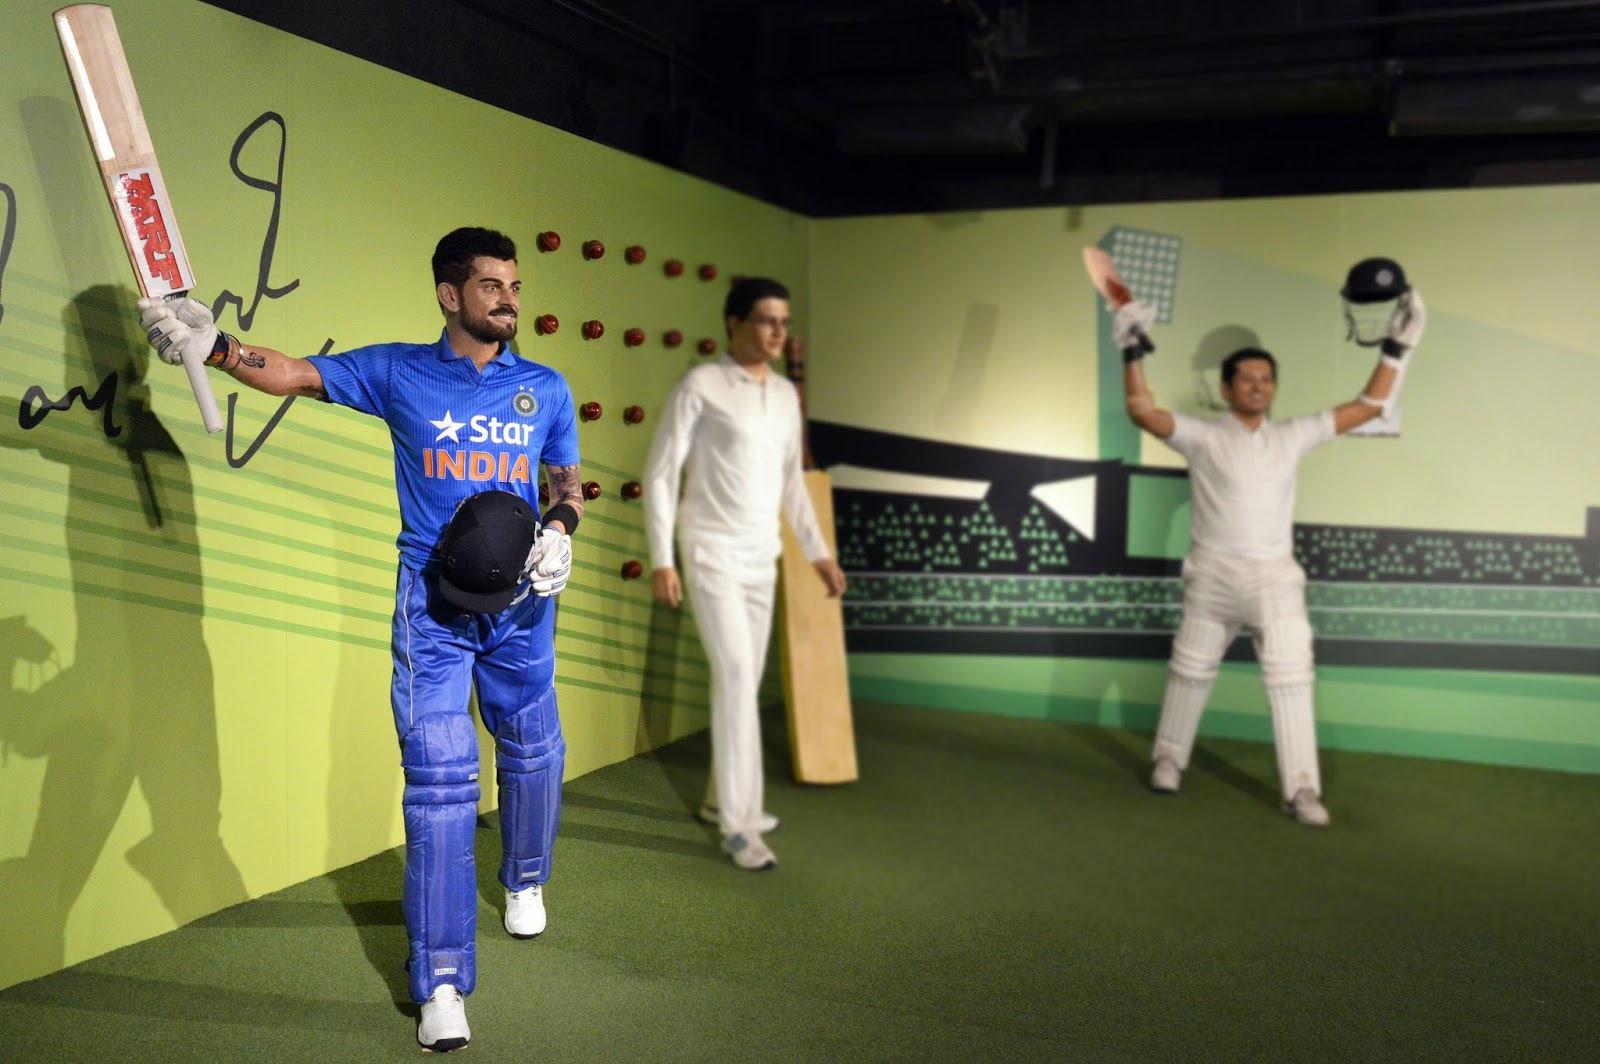 Virat Kohli, Madame Tussauds, Lionel Messi, Kapil Dev, Usian Bolt, Madame Tussauds museum in New Delhi, Indian cricket team skipper, Indian cricket team captain, Indian cricket team jersey, Cricket news, Sports news